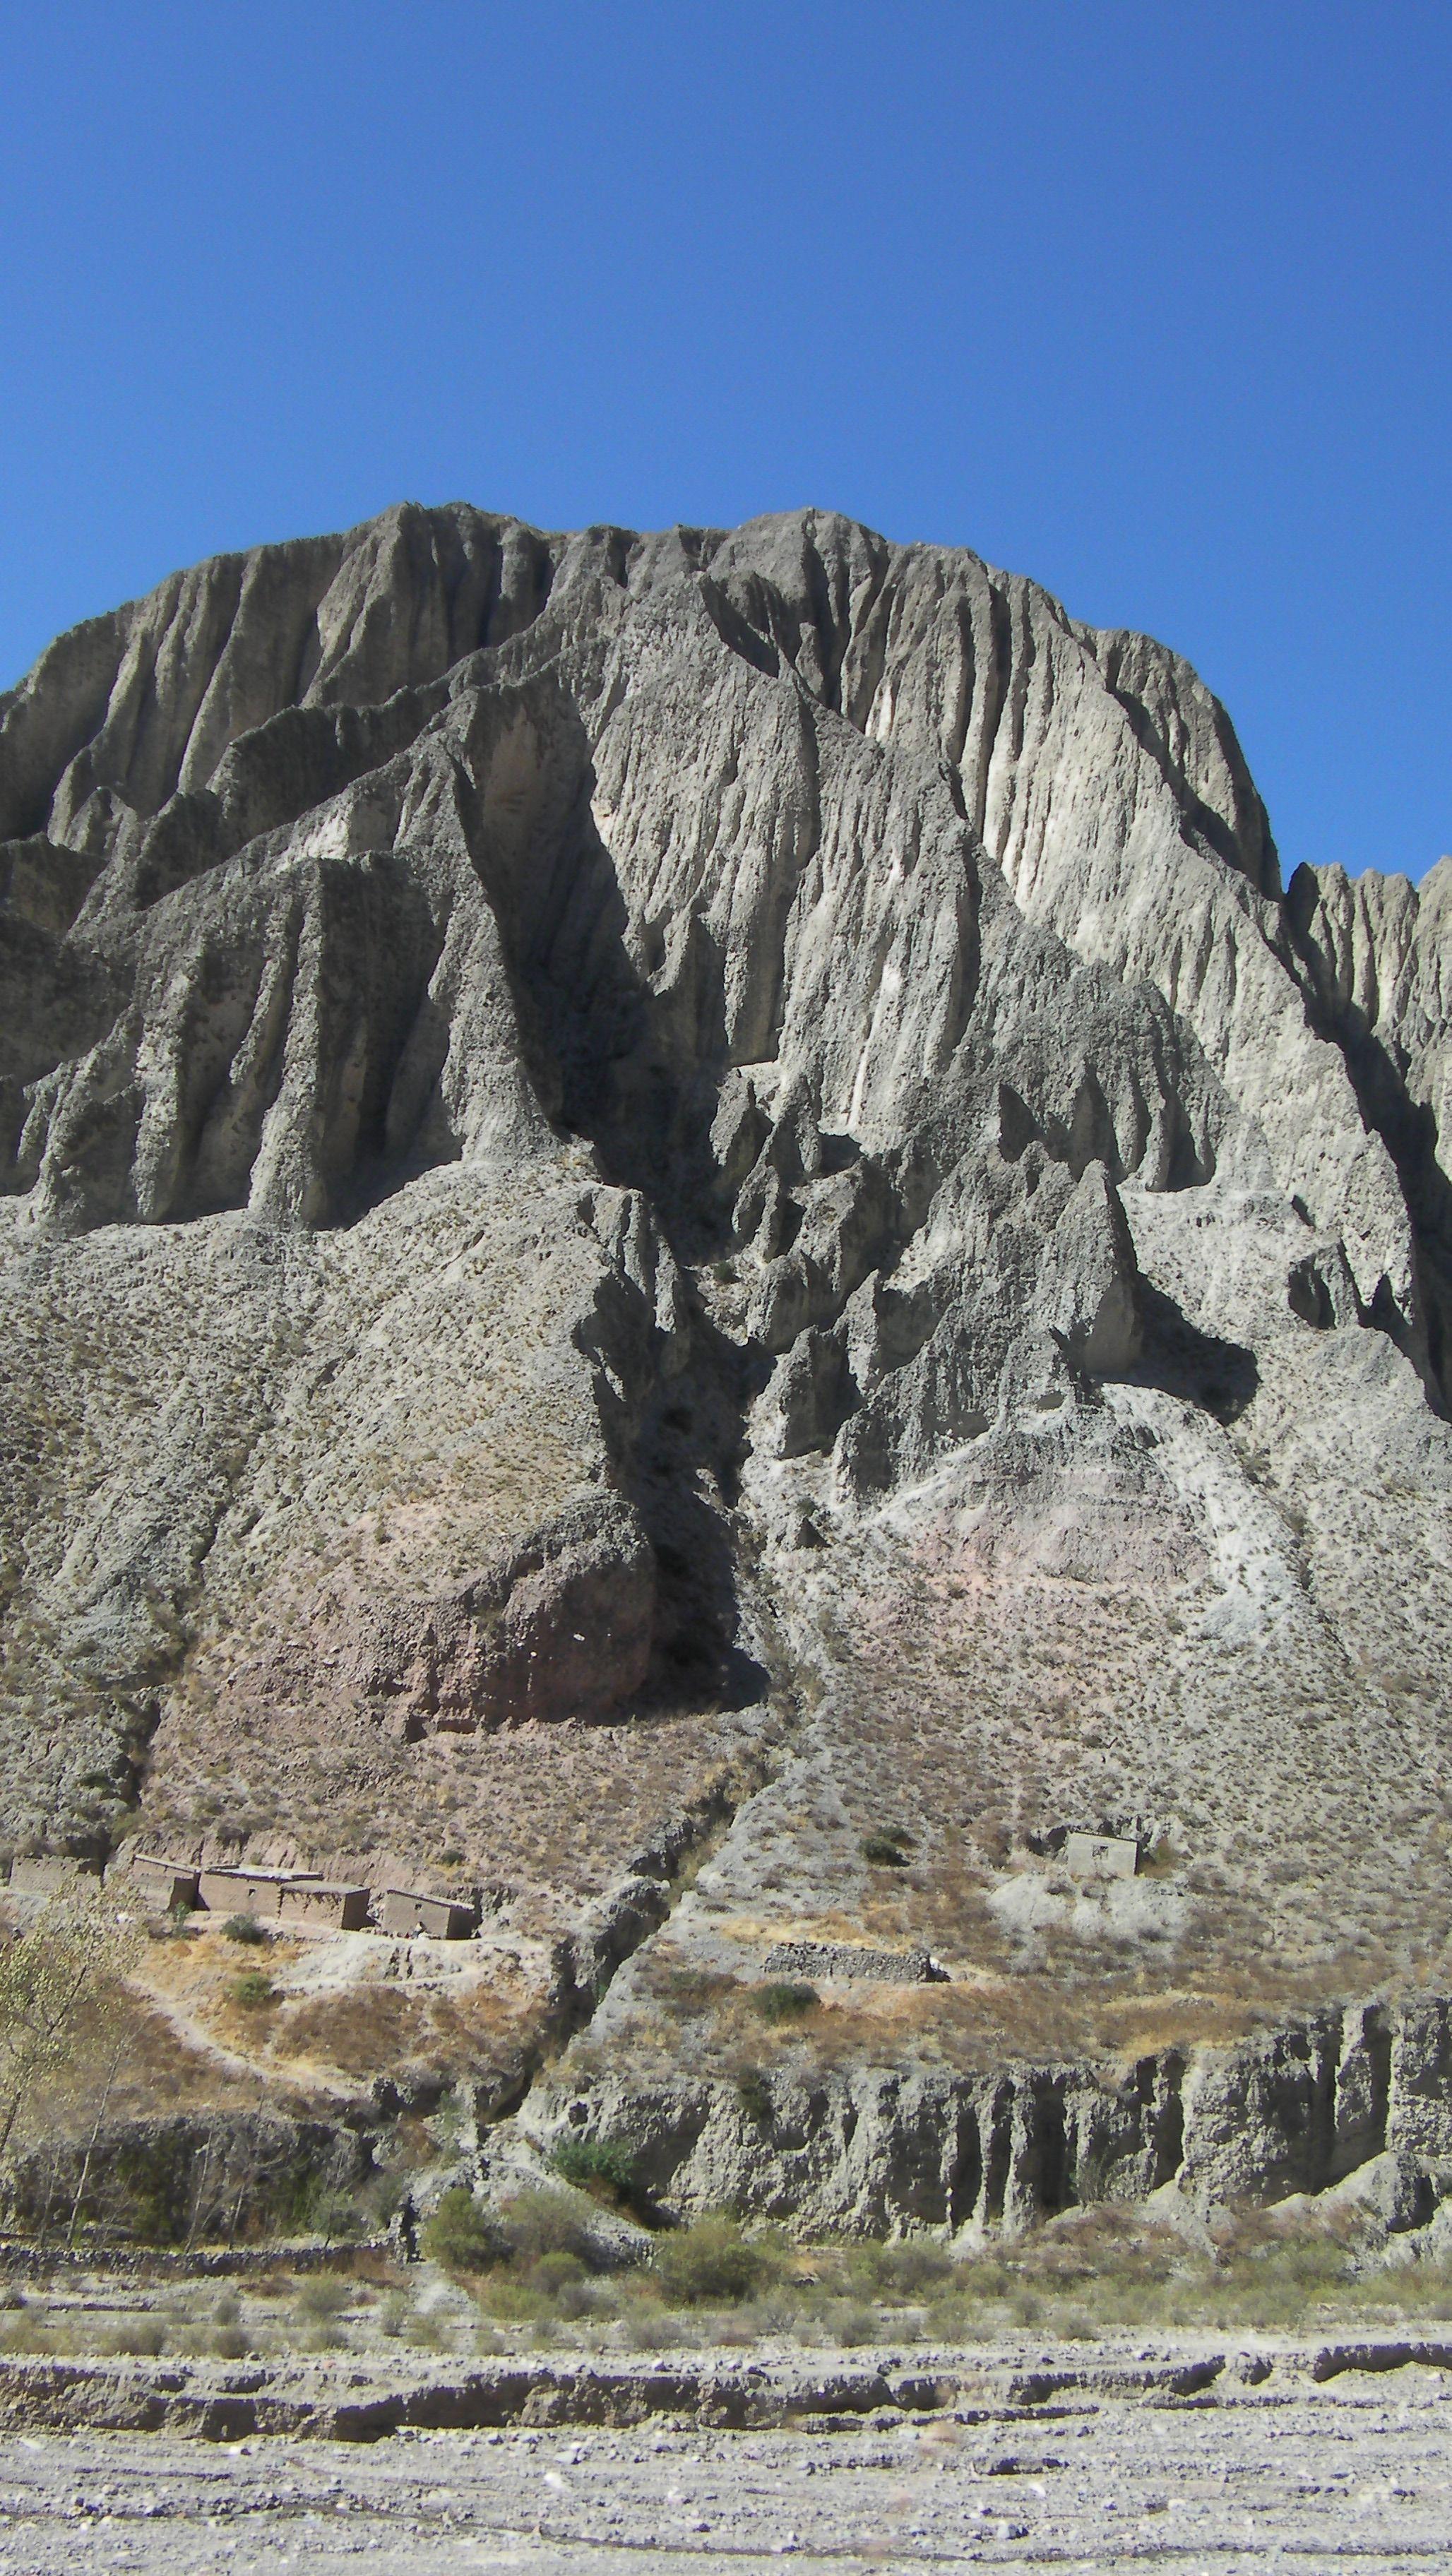 camino a Iruya - Noroeste argentino